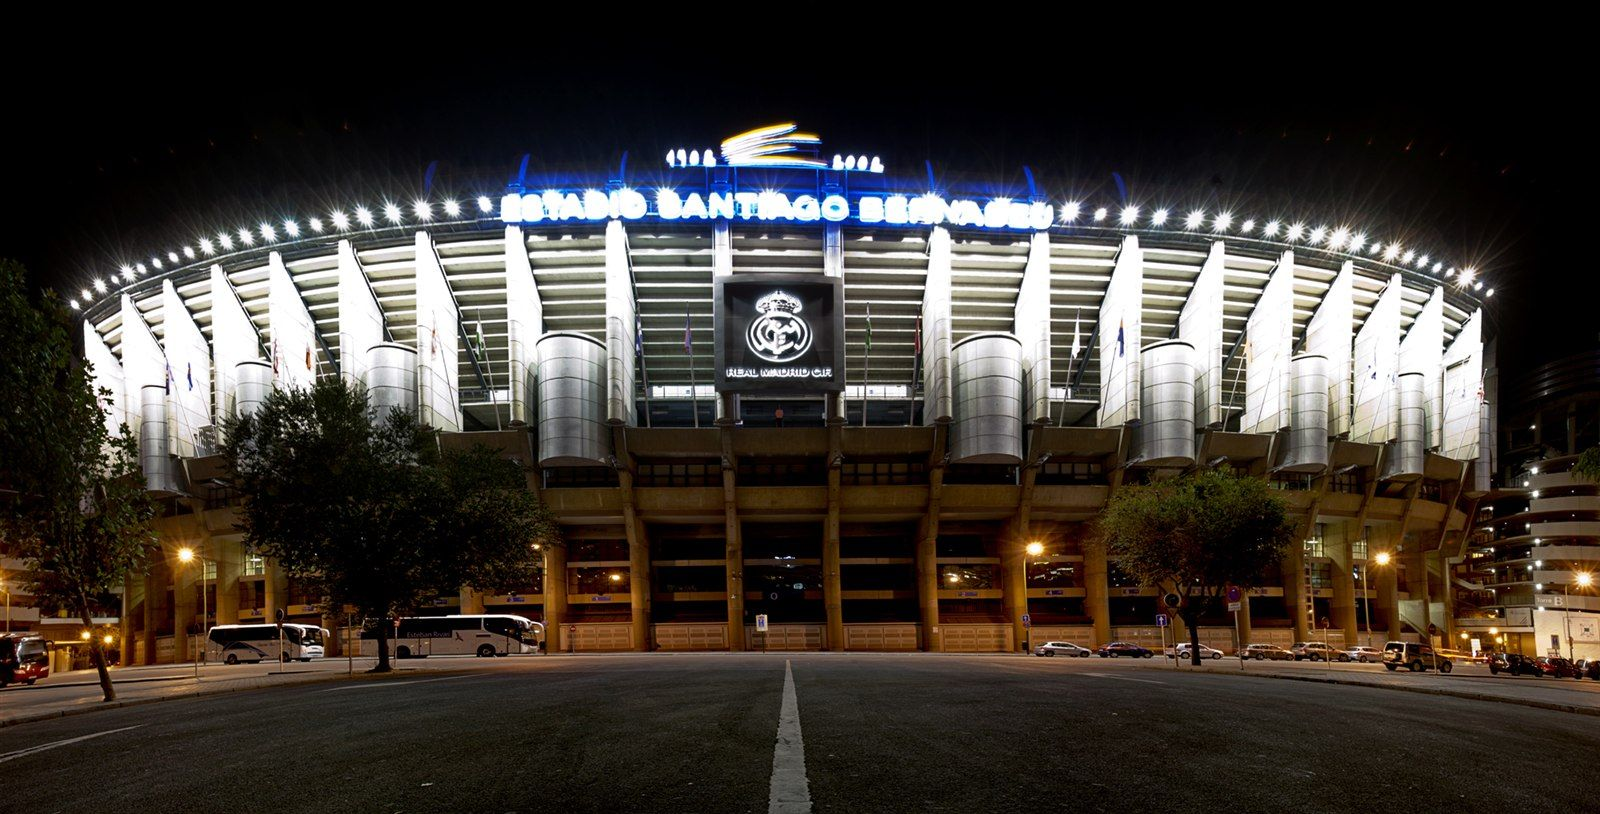 Santiago Bernabeu Hd Wallpaper Jpg 1600 814 Fondos De Pantalla Real Madrid Bernabeu Santiago Bernabeu